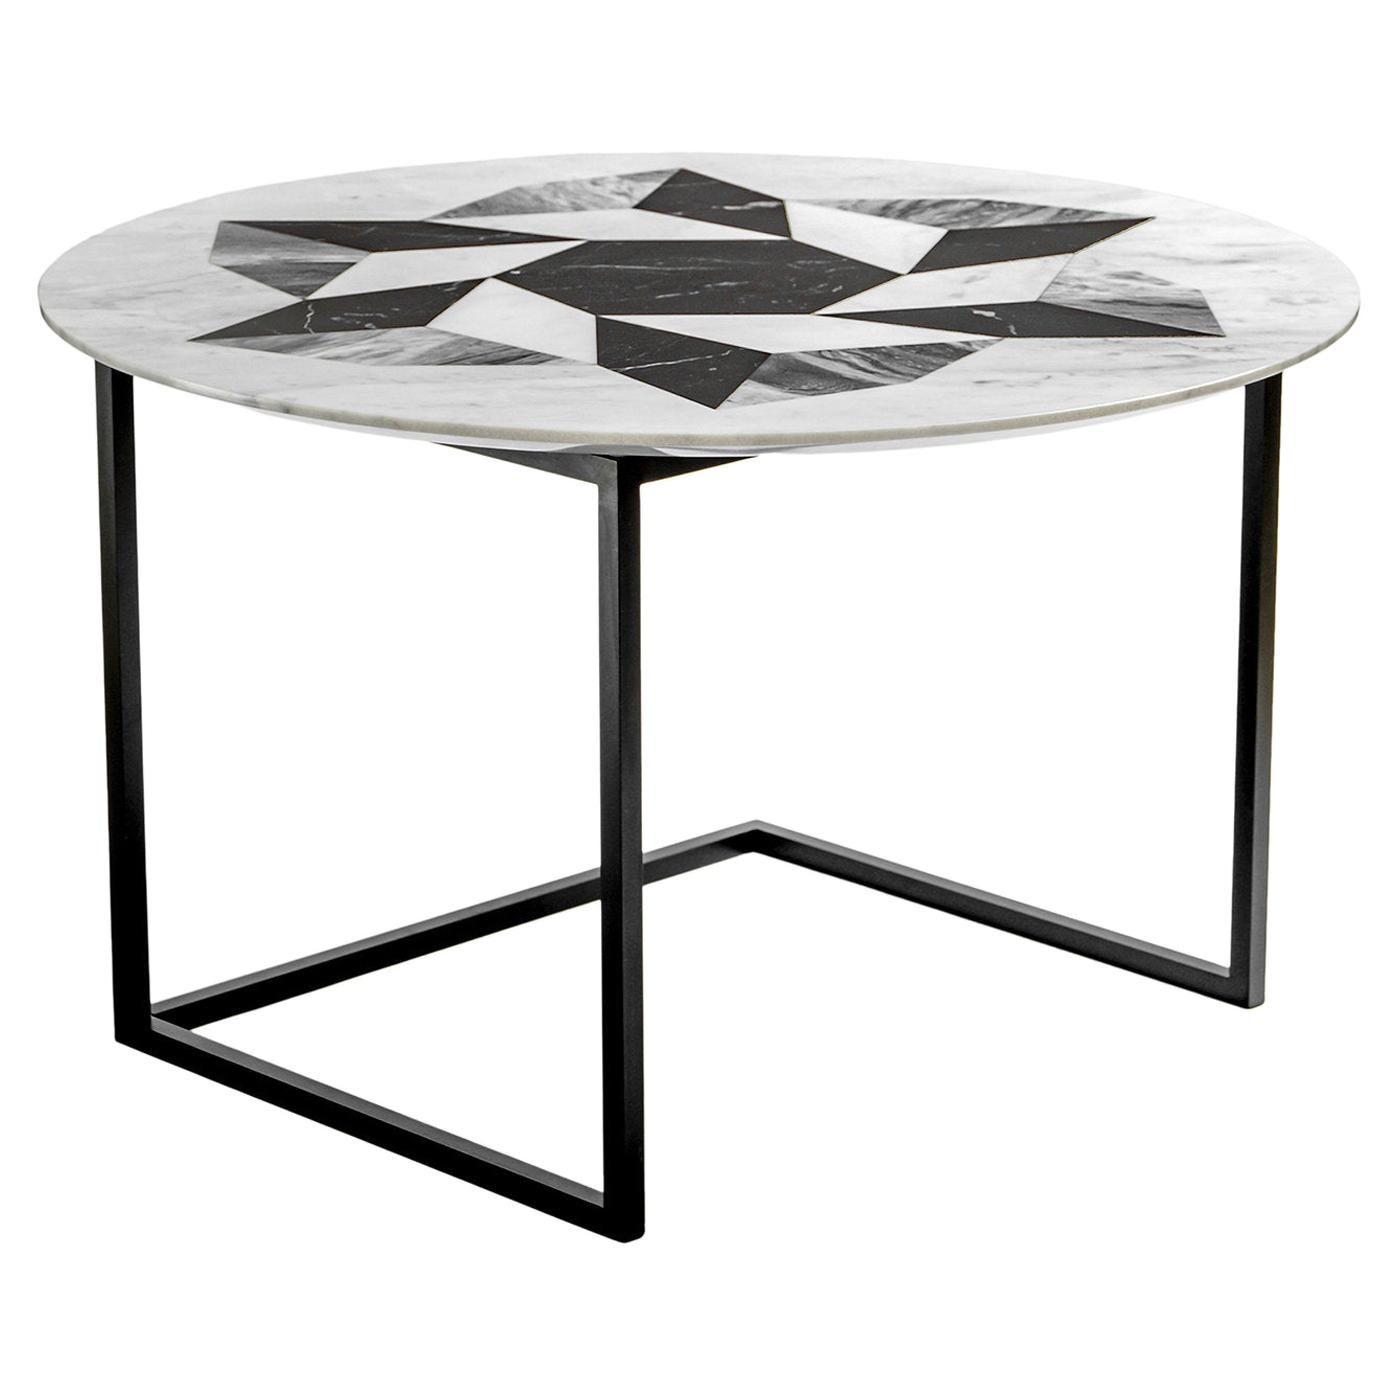 Esopo Coffee Table with Geometric Wheel by Antonio Saporito